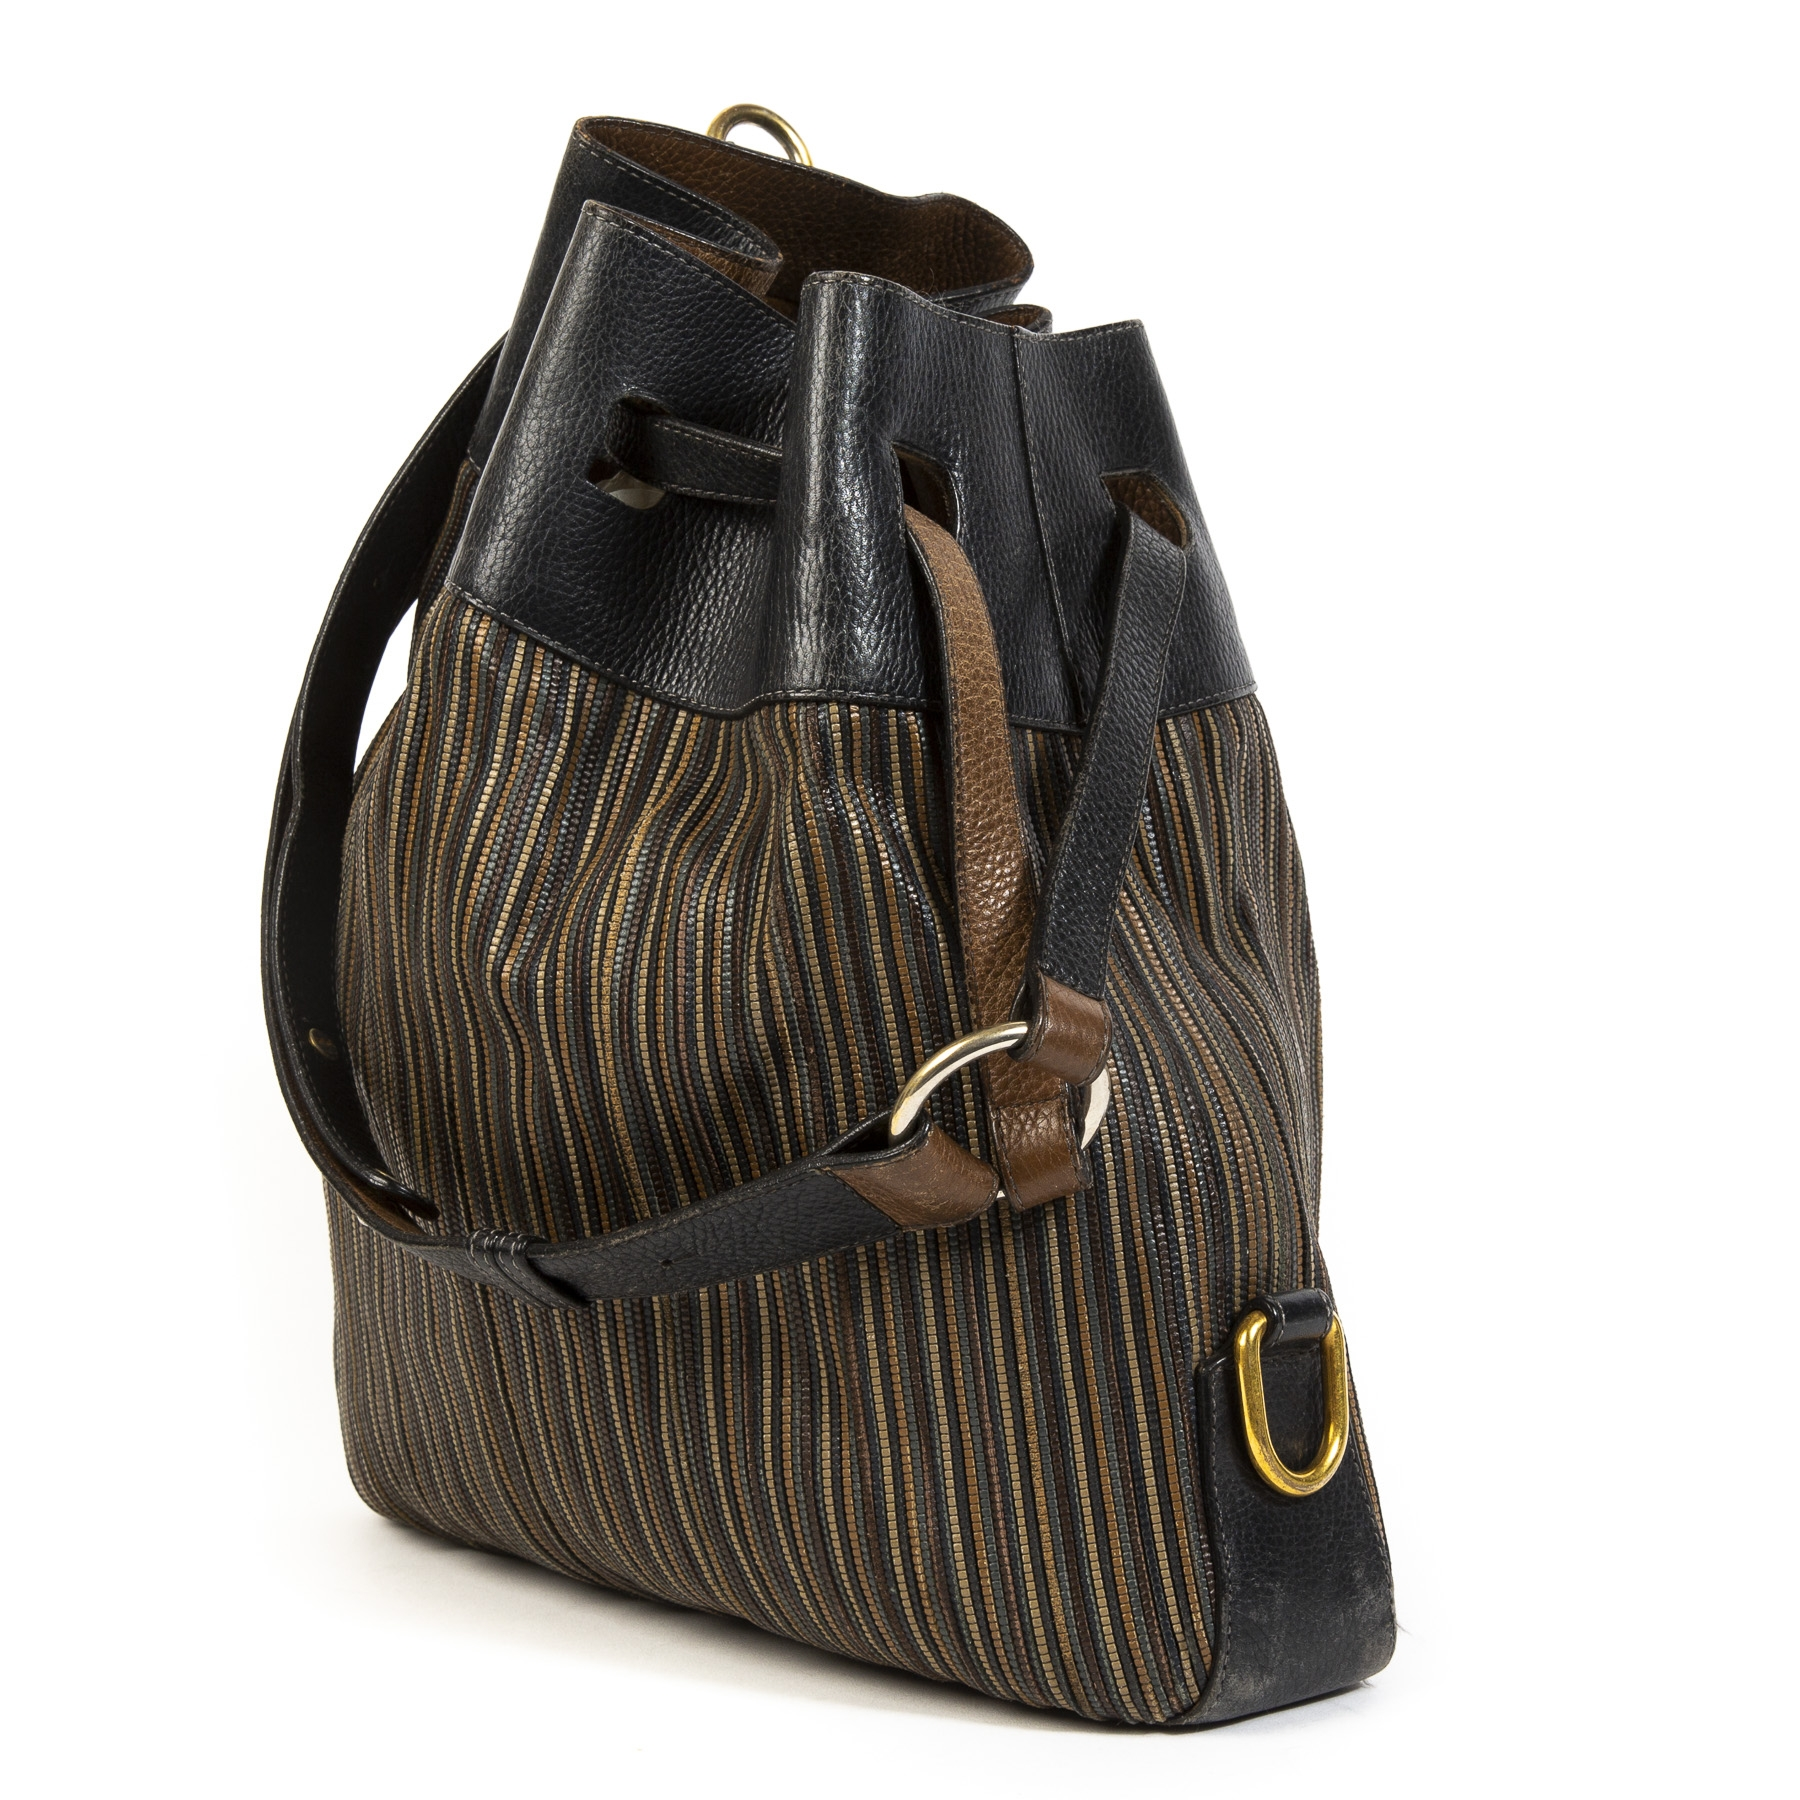 aadb76d62cd5a5 Labellov Shop Authentic Vintage Luxury Designer Handbags Online ...